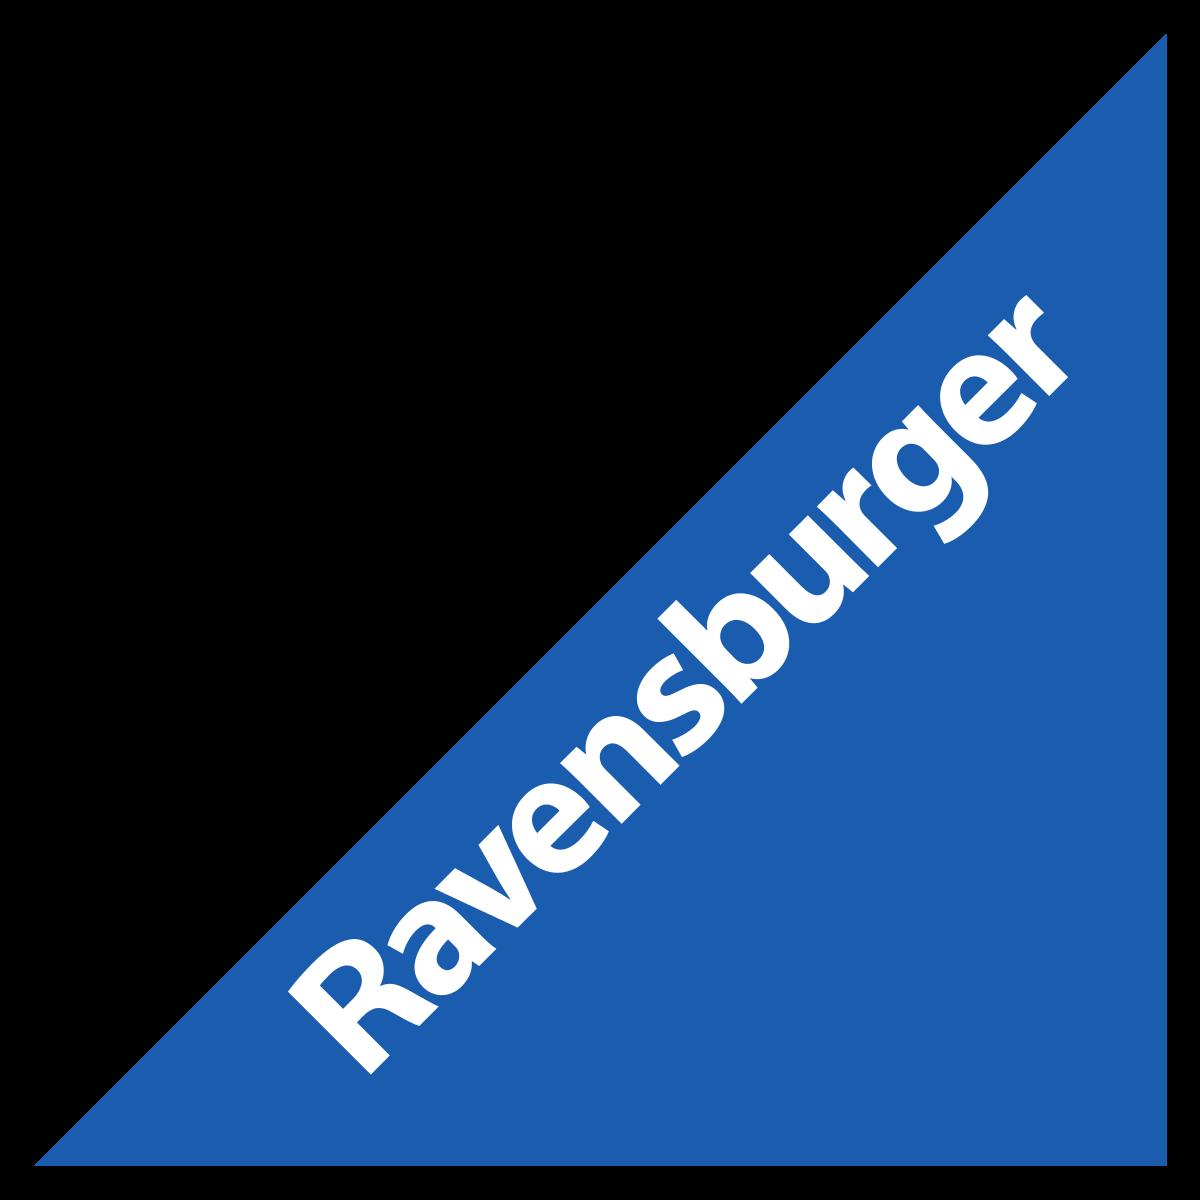 Ravensburger Buchverlag